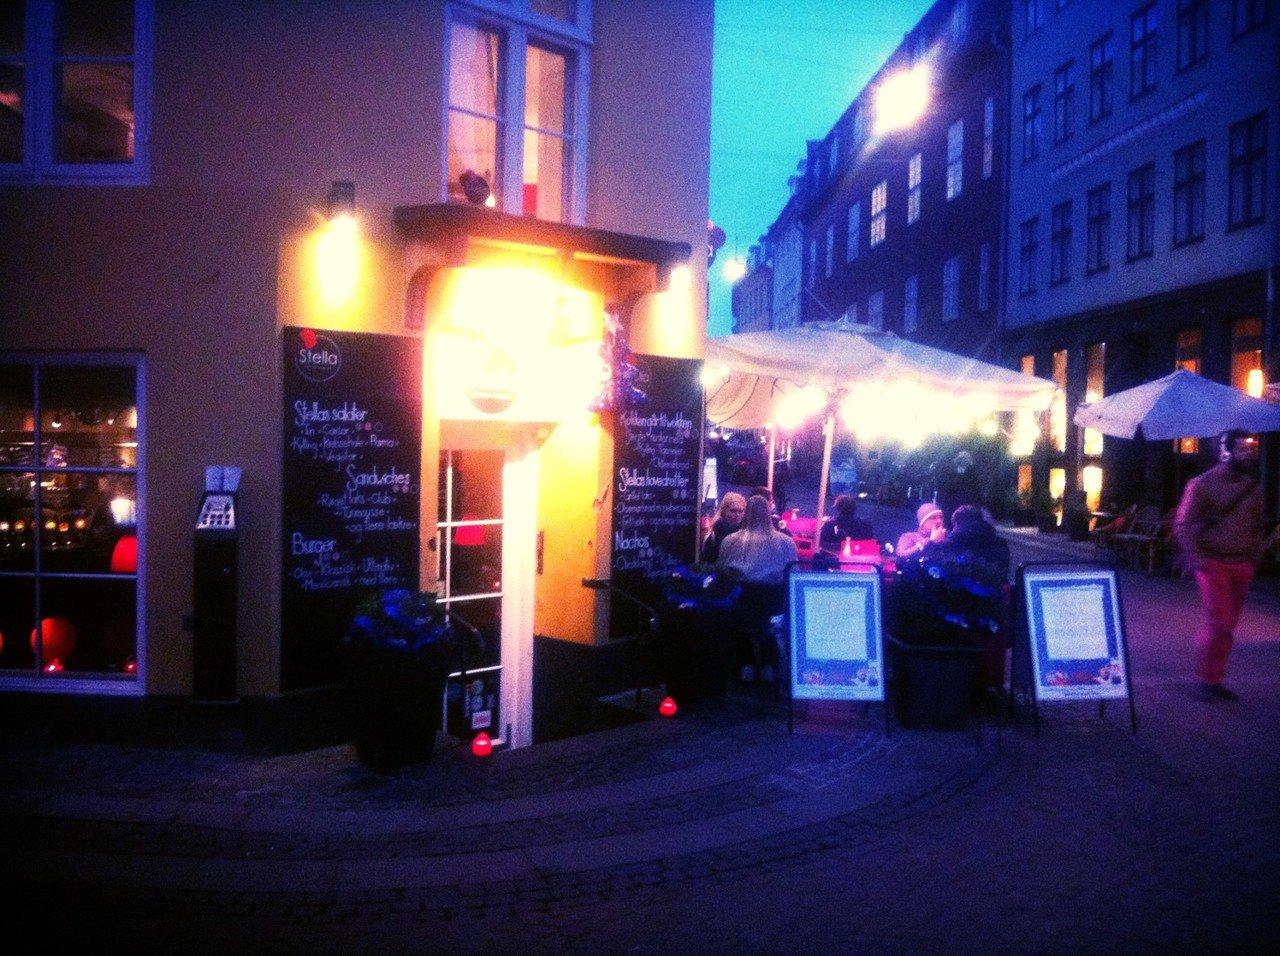 Kopenhagen corporate event venues Cafe Cafe Stella image 0